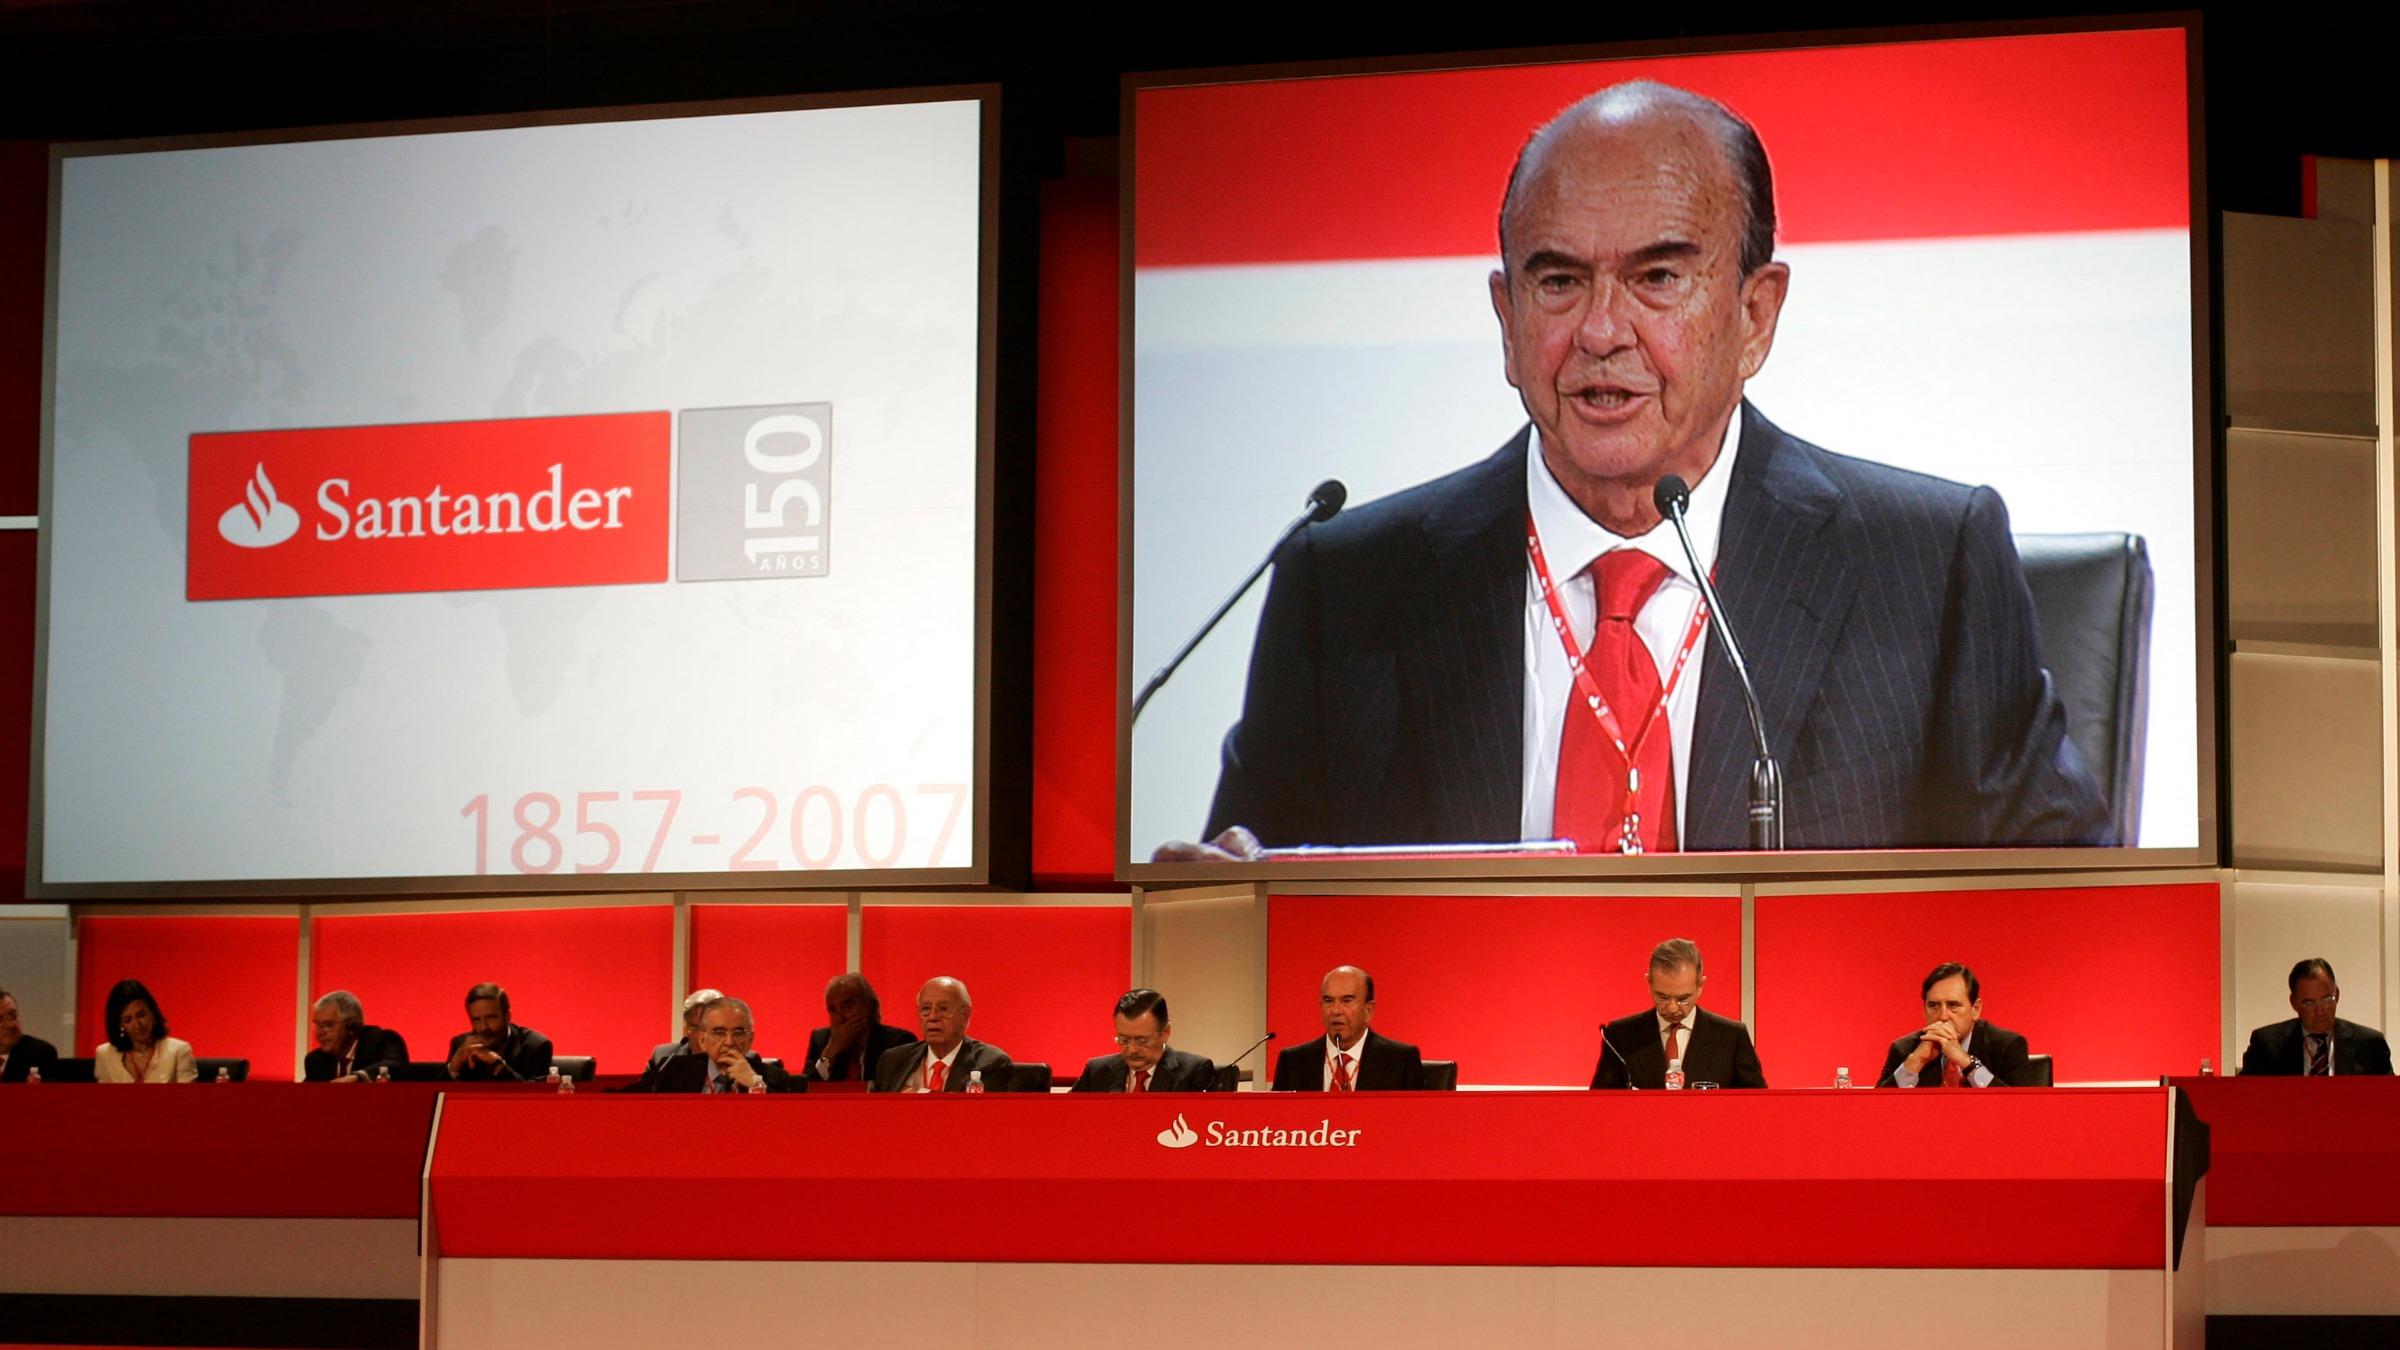 Banco Santander Emilio Botin